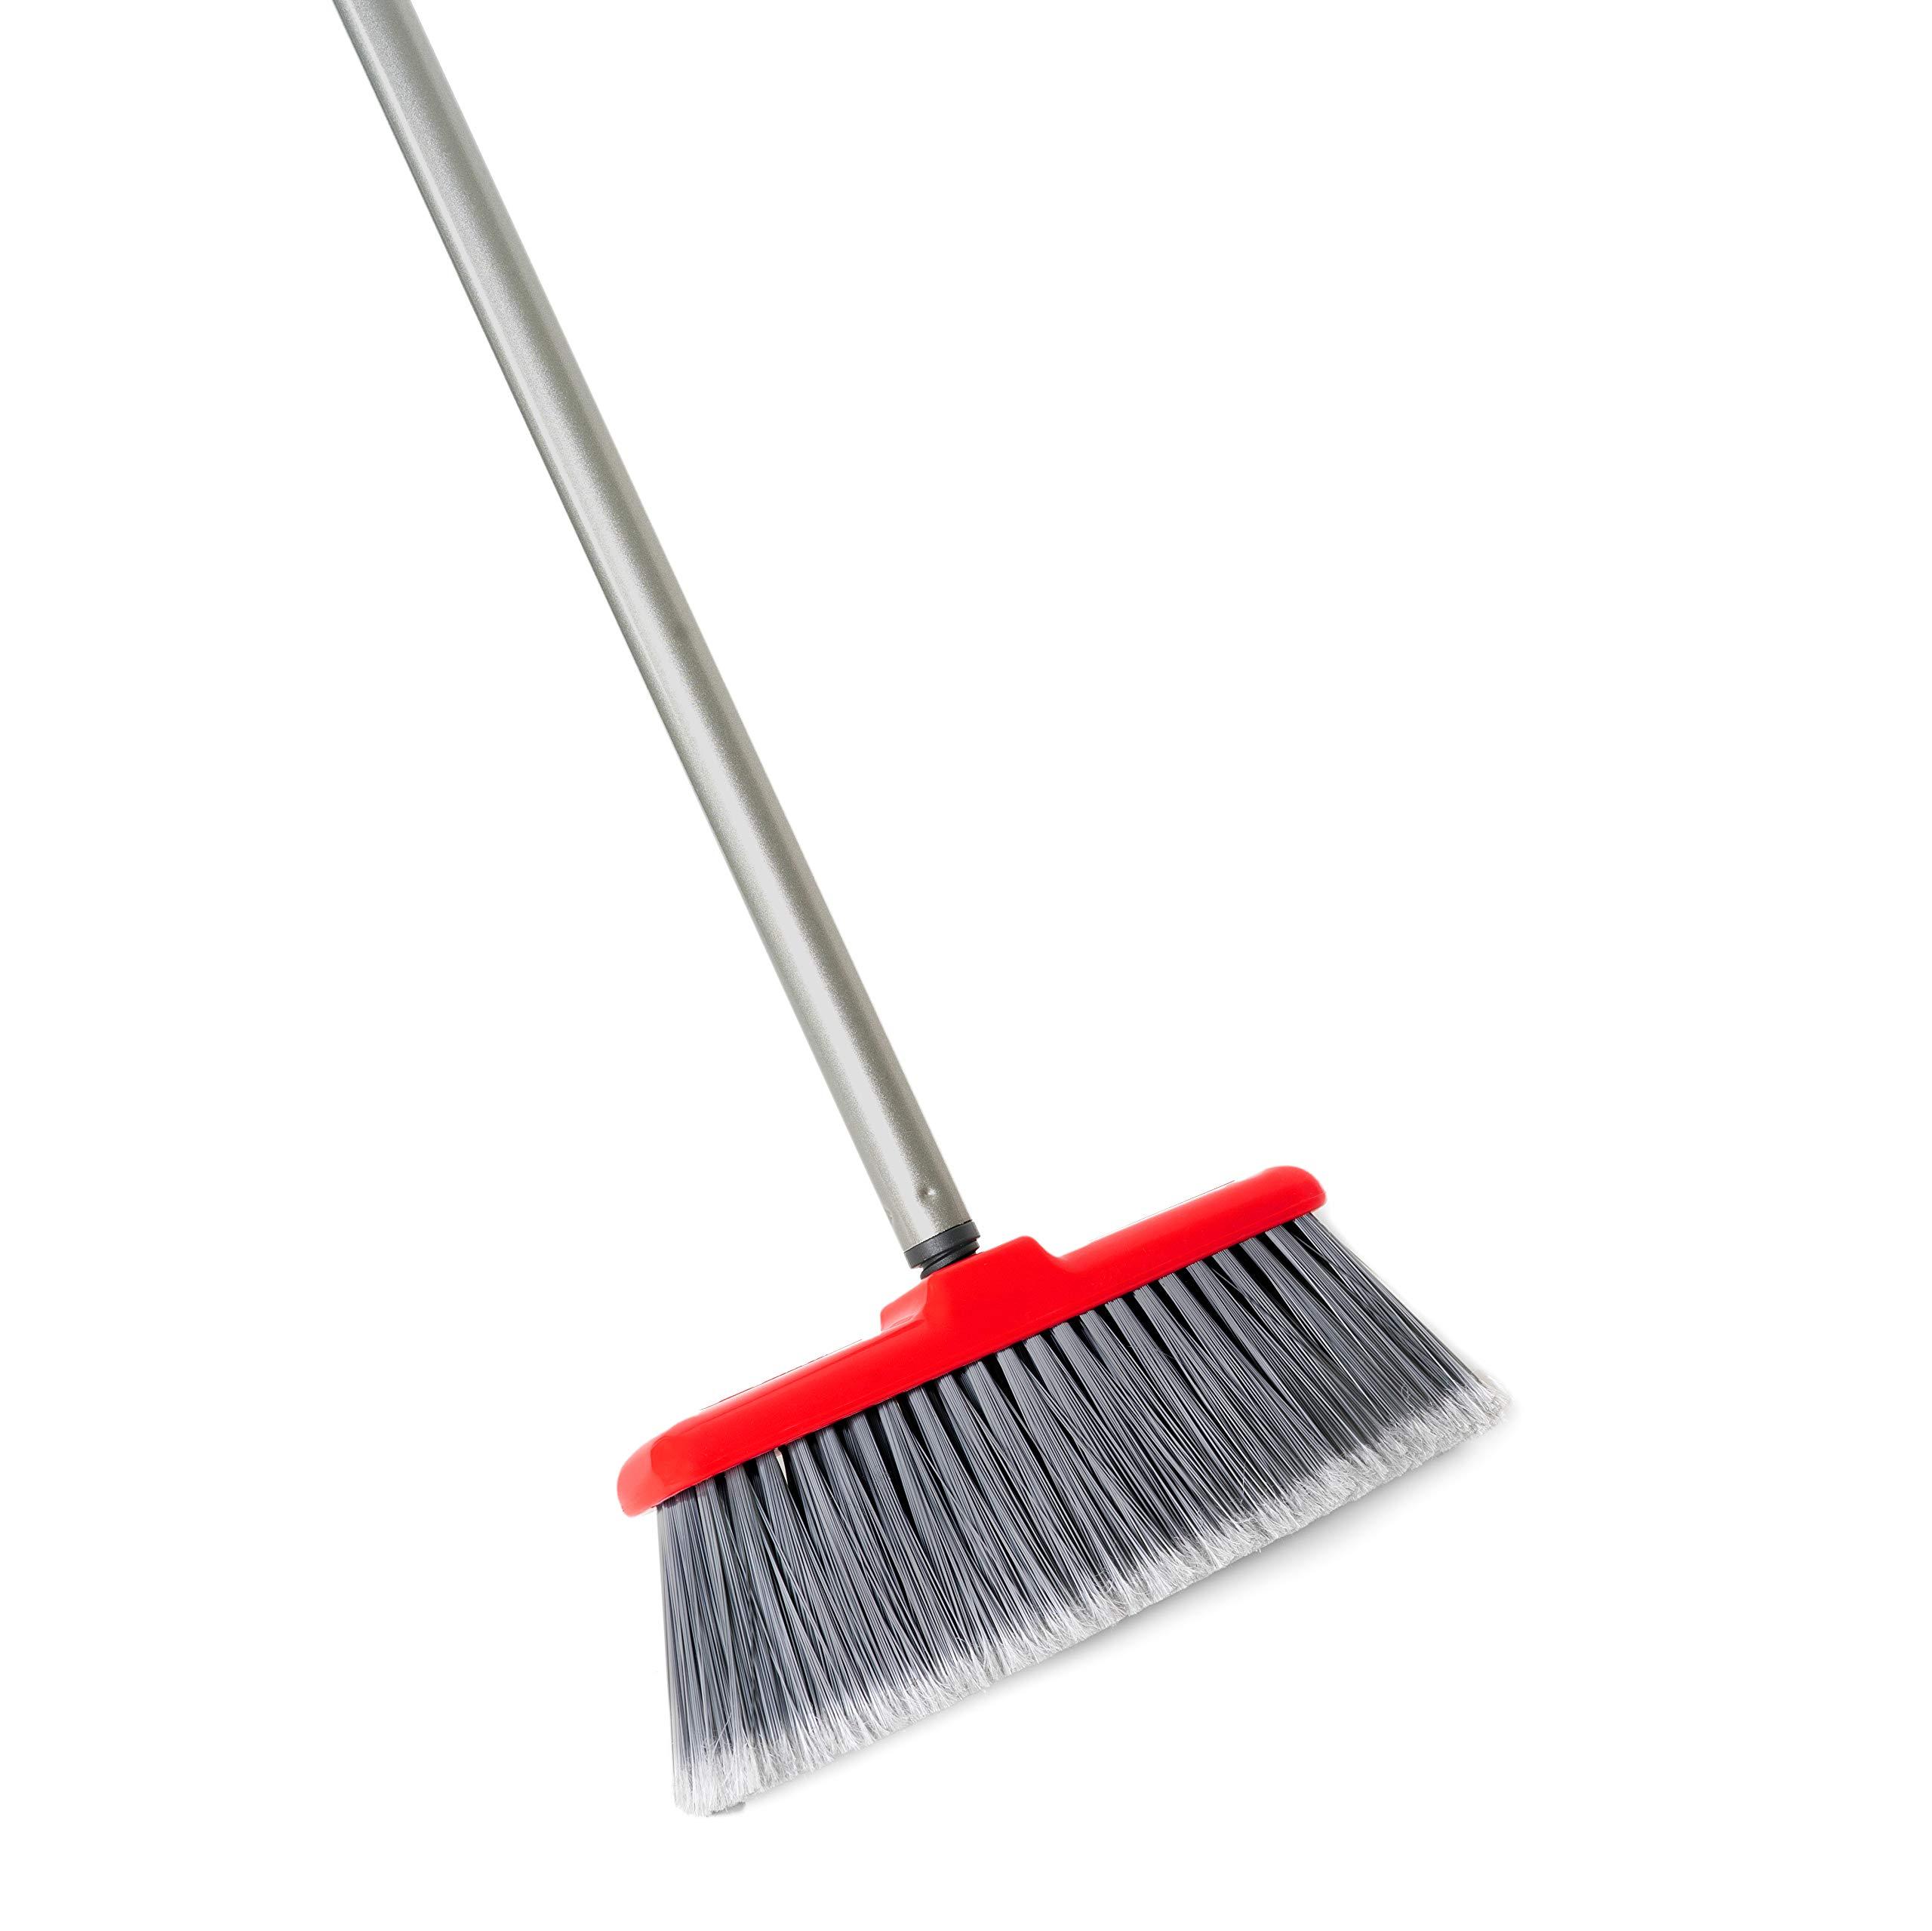 Fuller Brush Fiesta Red Kitchen Broom - Heavy Duty Floor Sweeper w/Extendable Steel Handle & Fine Long Bristles - Dust Sweeping For Home/Commercial Kitchen & Warehouse Floors by Fuller Brush